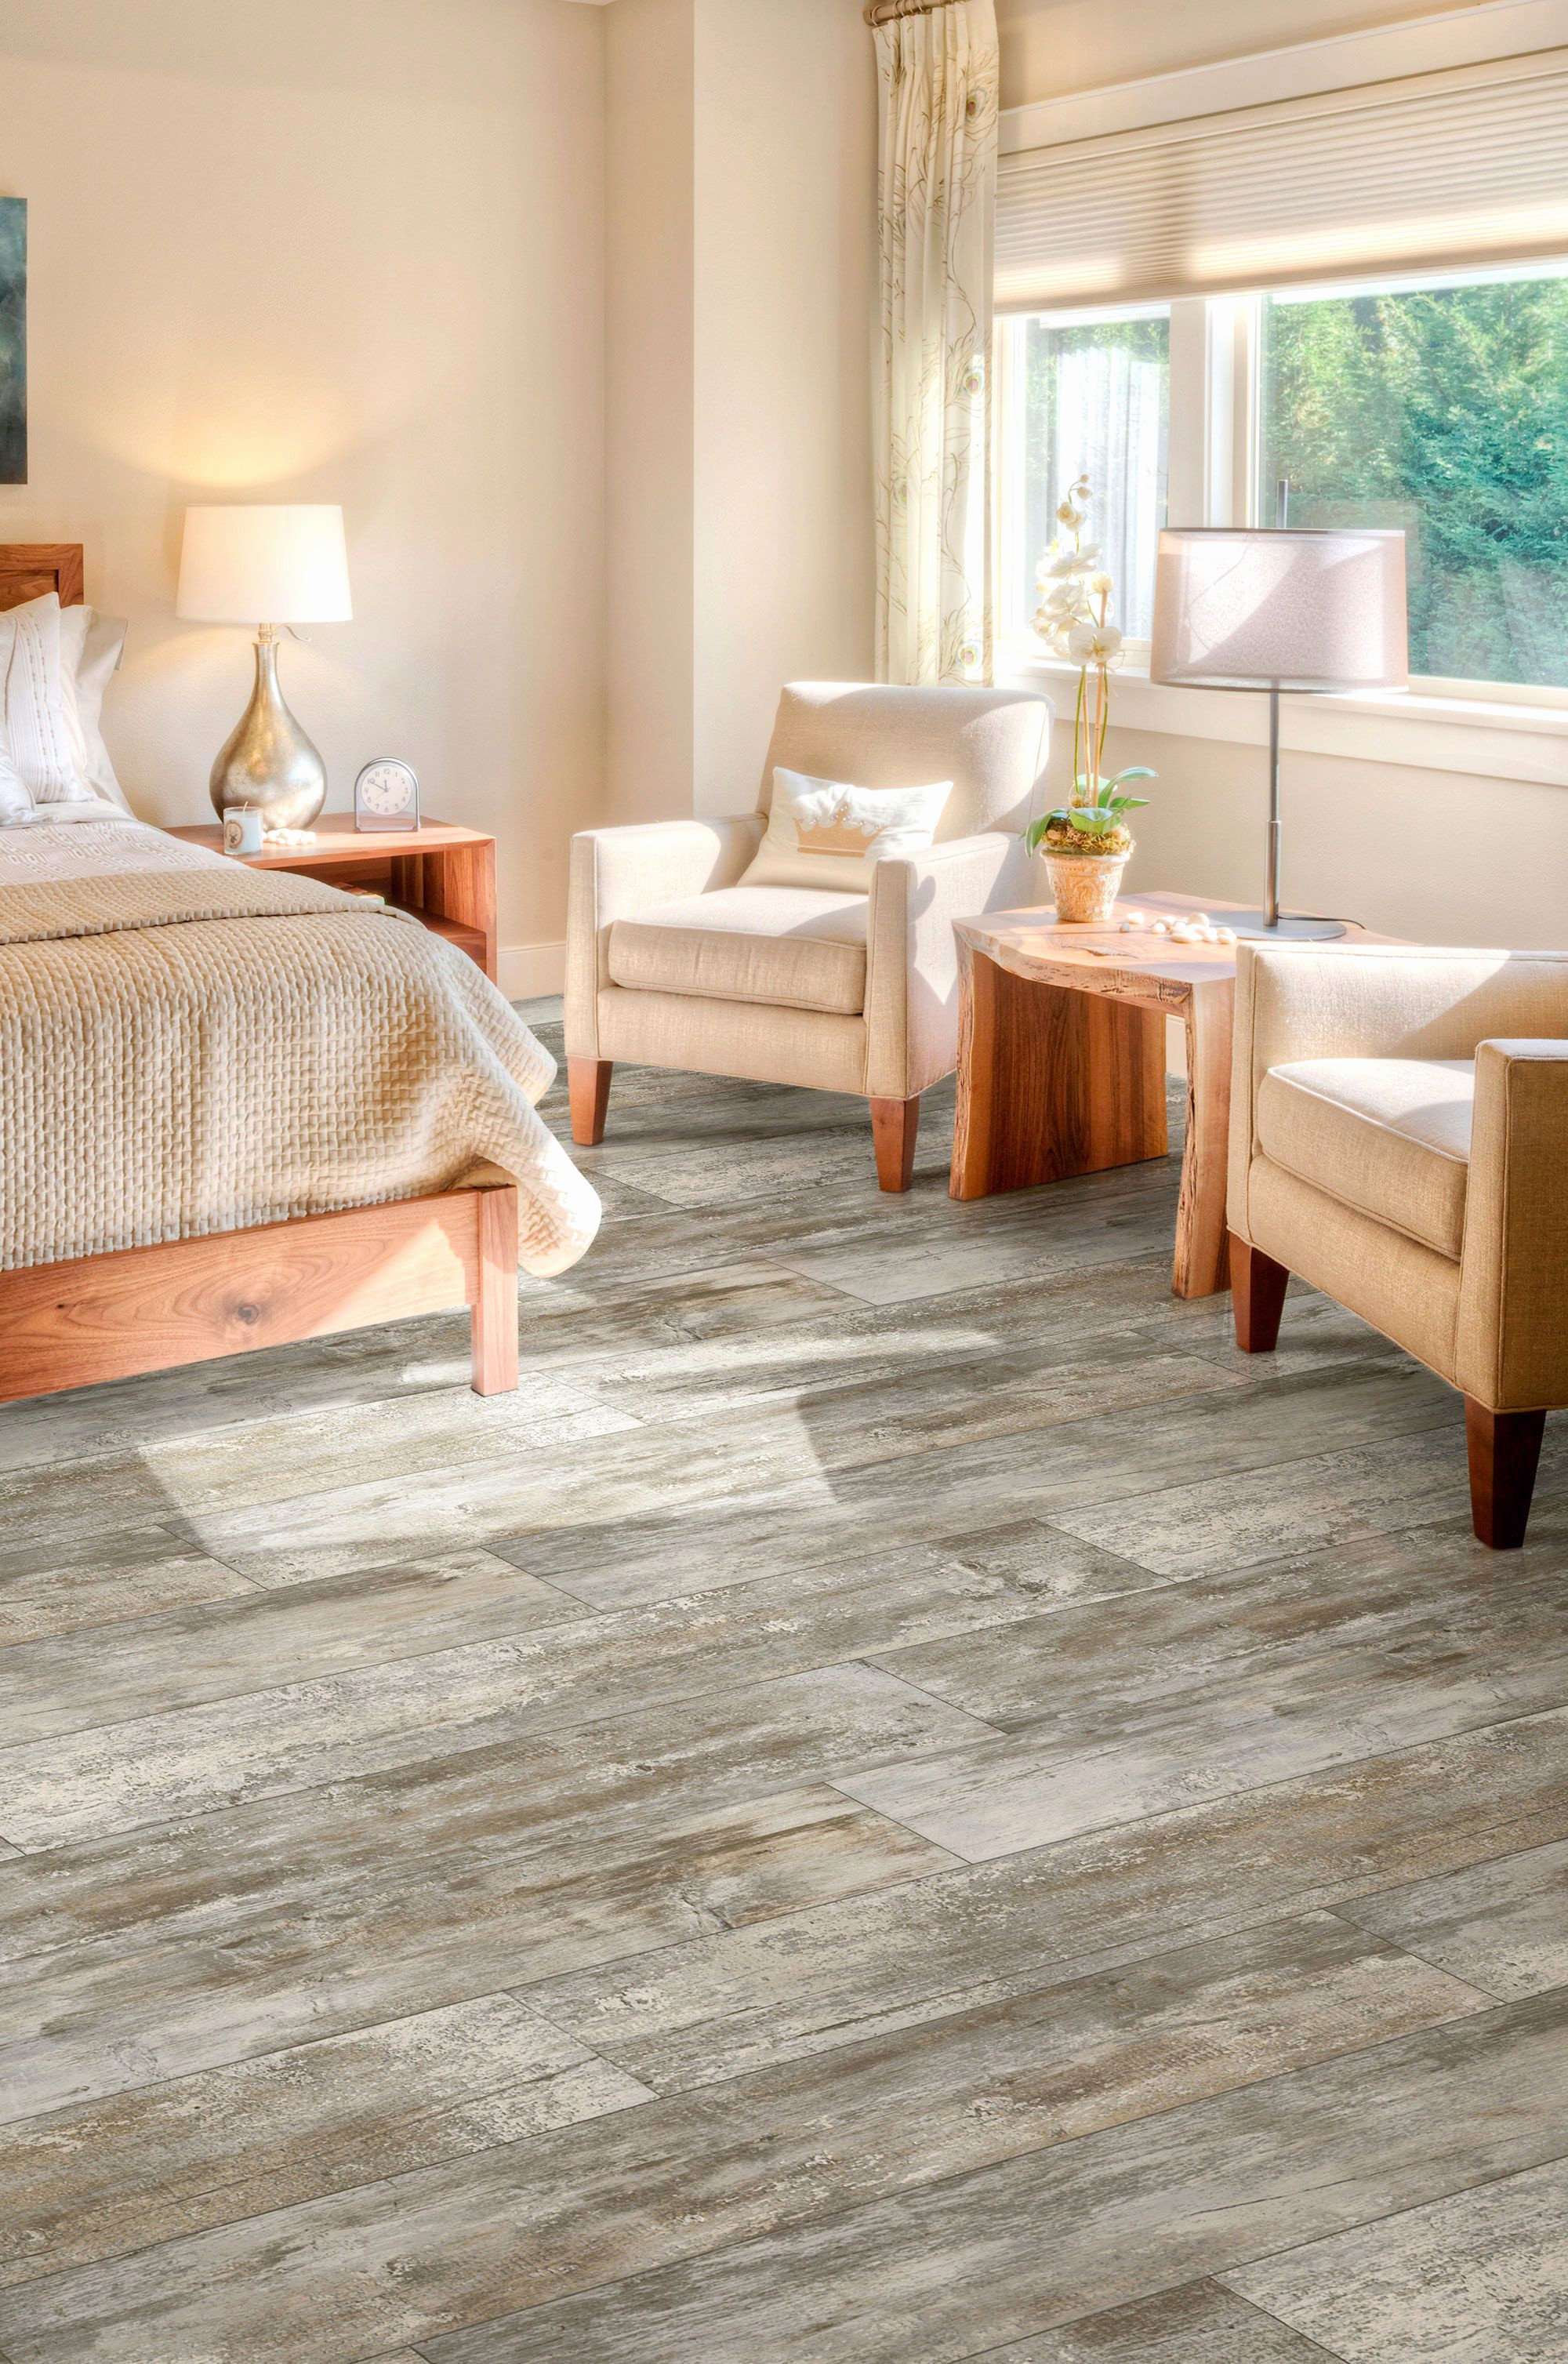 Buy Direct Hardwood Flooring Of Direct Flooring Hardwood Floor Stairs Podemosleganes Floor Plan In Direct Flooring Hardwood Floor Types Unique I Pinimg 736x 0d 7b 00 Luxury Wood